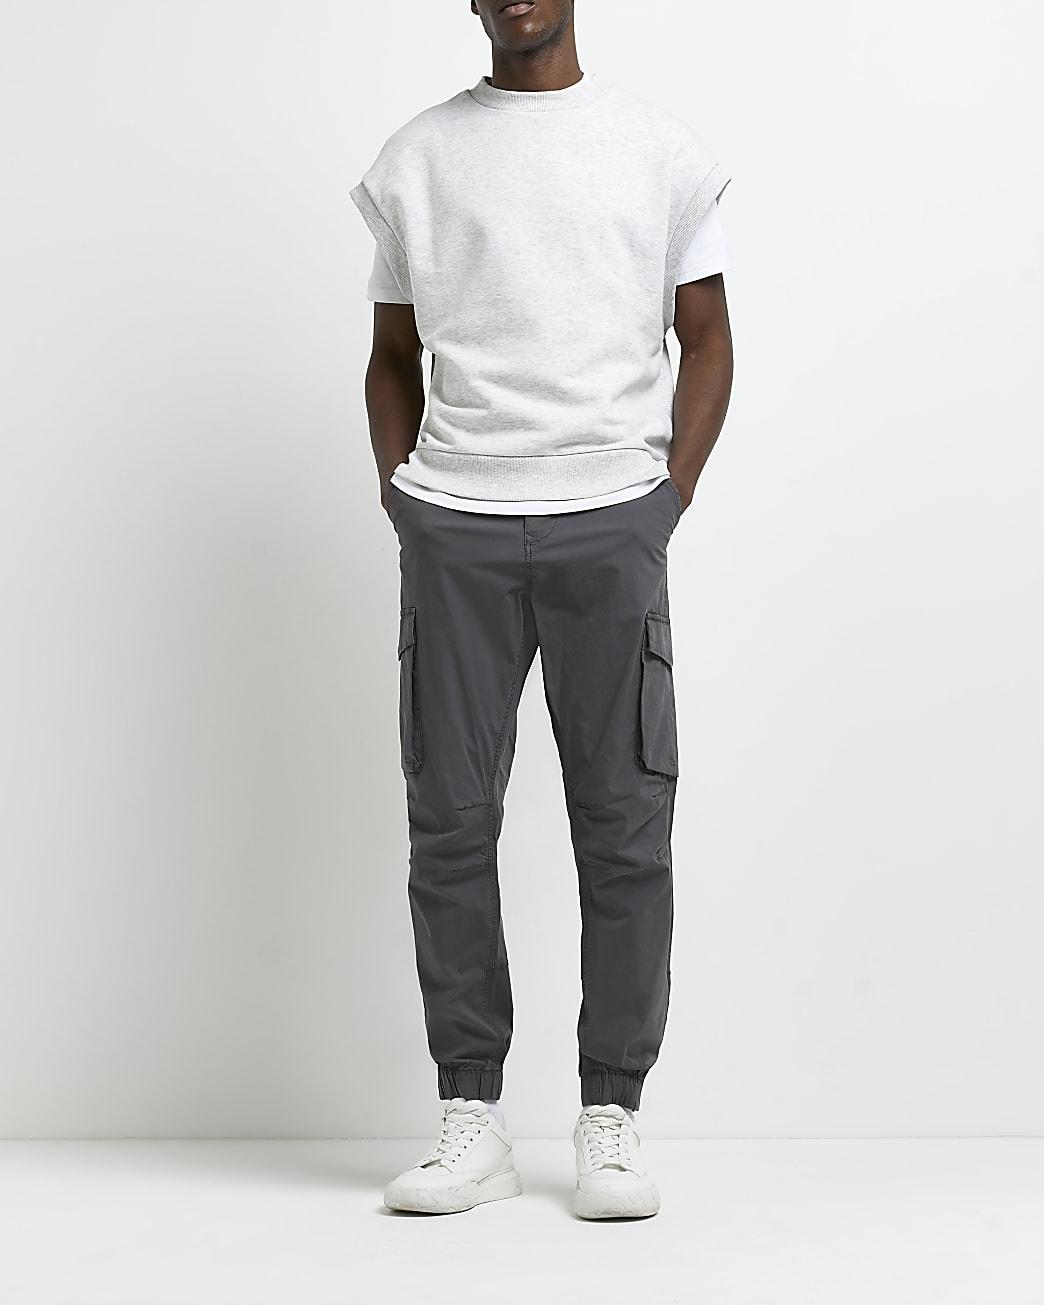 Grey side pocket cargo trousers